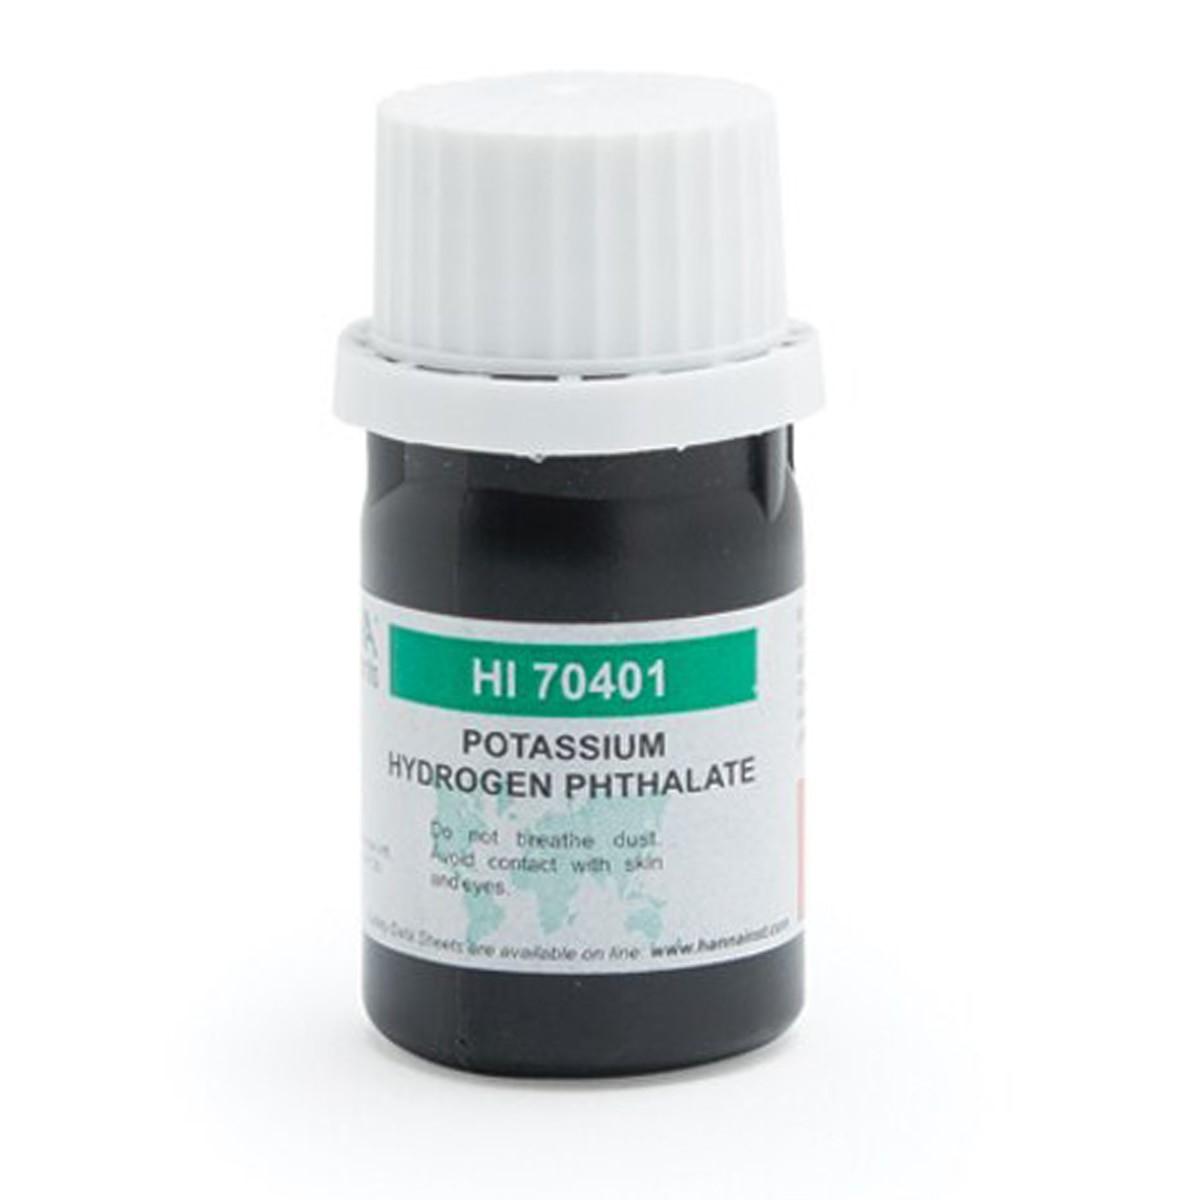 Potassium Hydrogen Phthalate, 20 g - HI70401